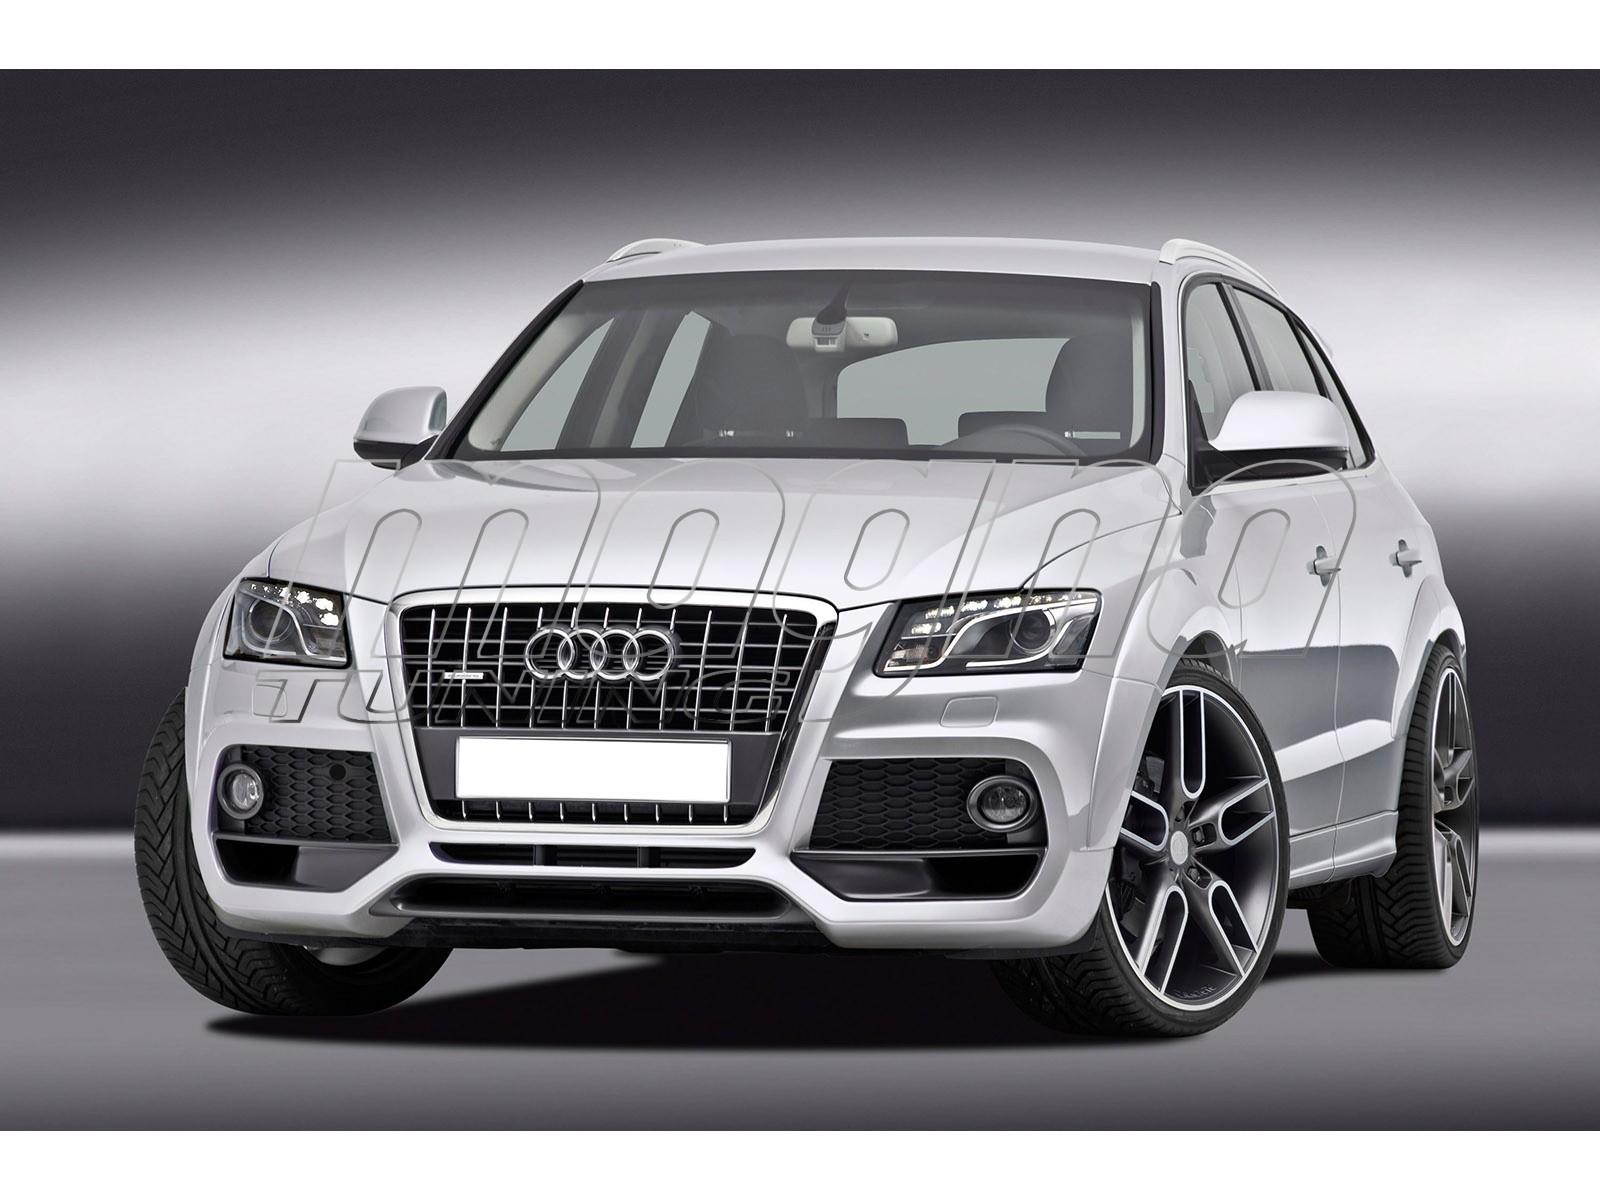 Audi Q5 8R C2 Wide Body Kit